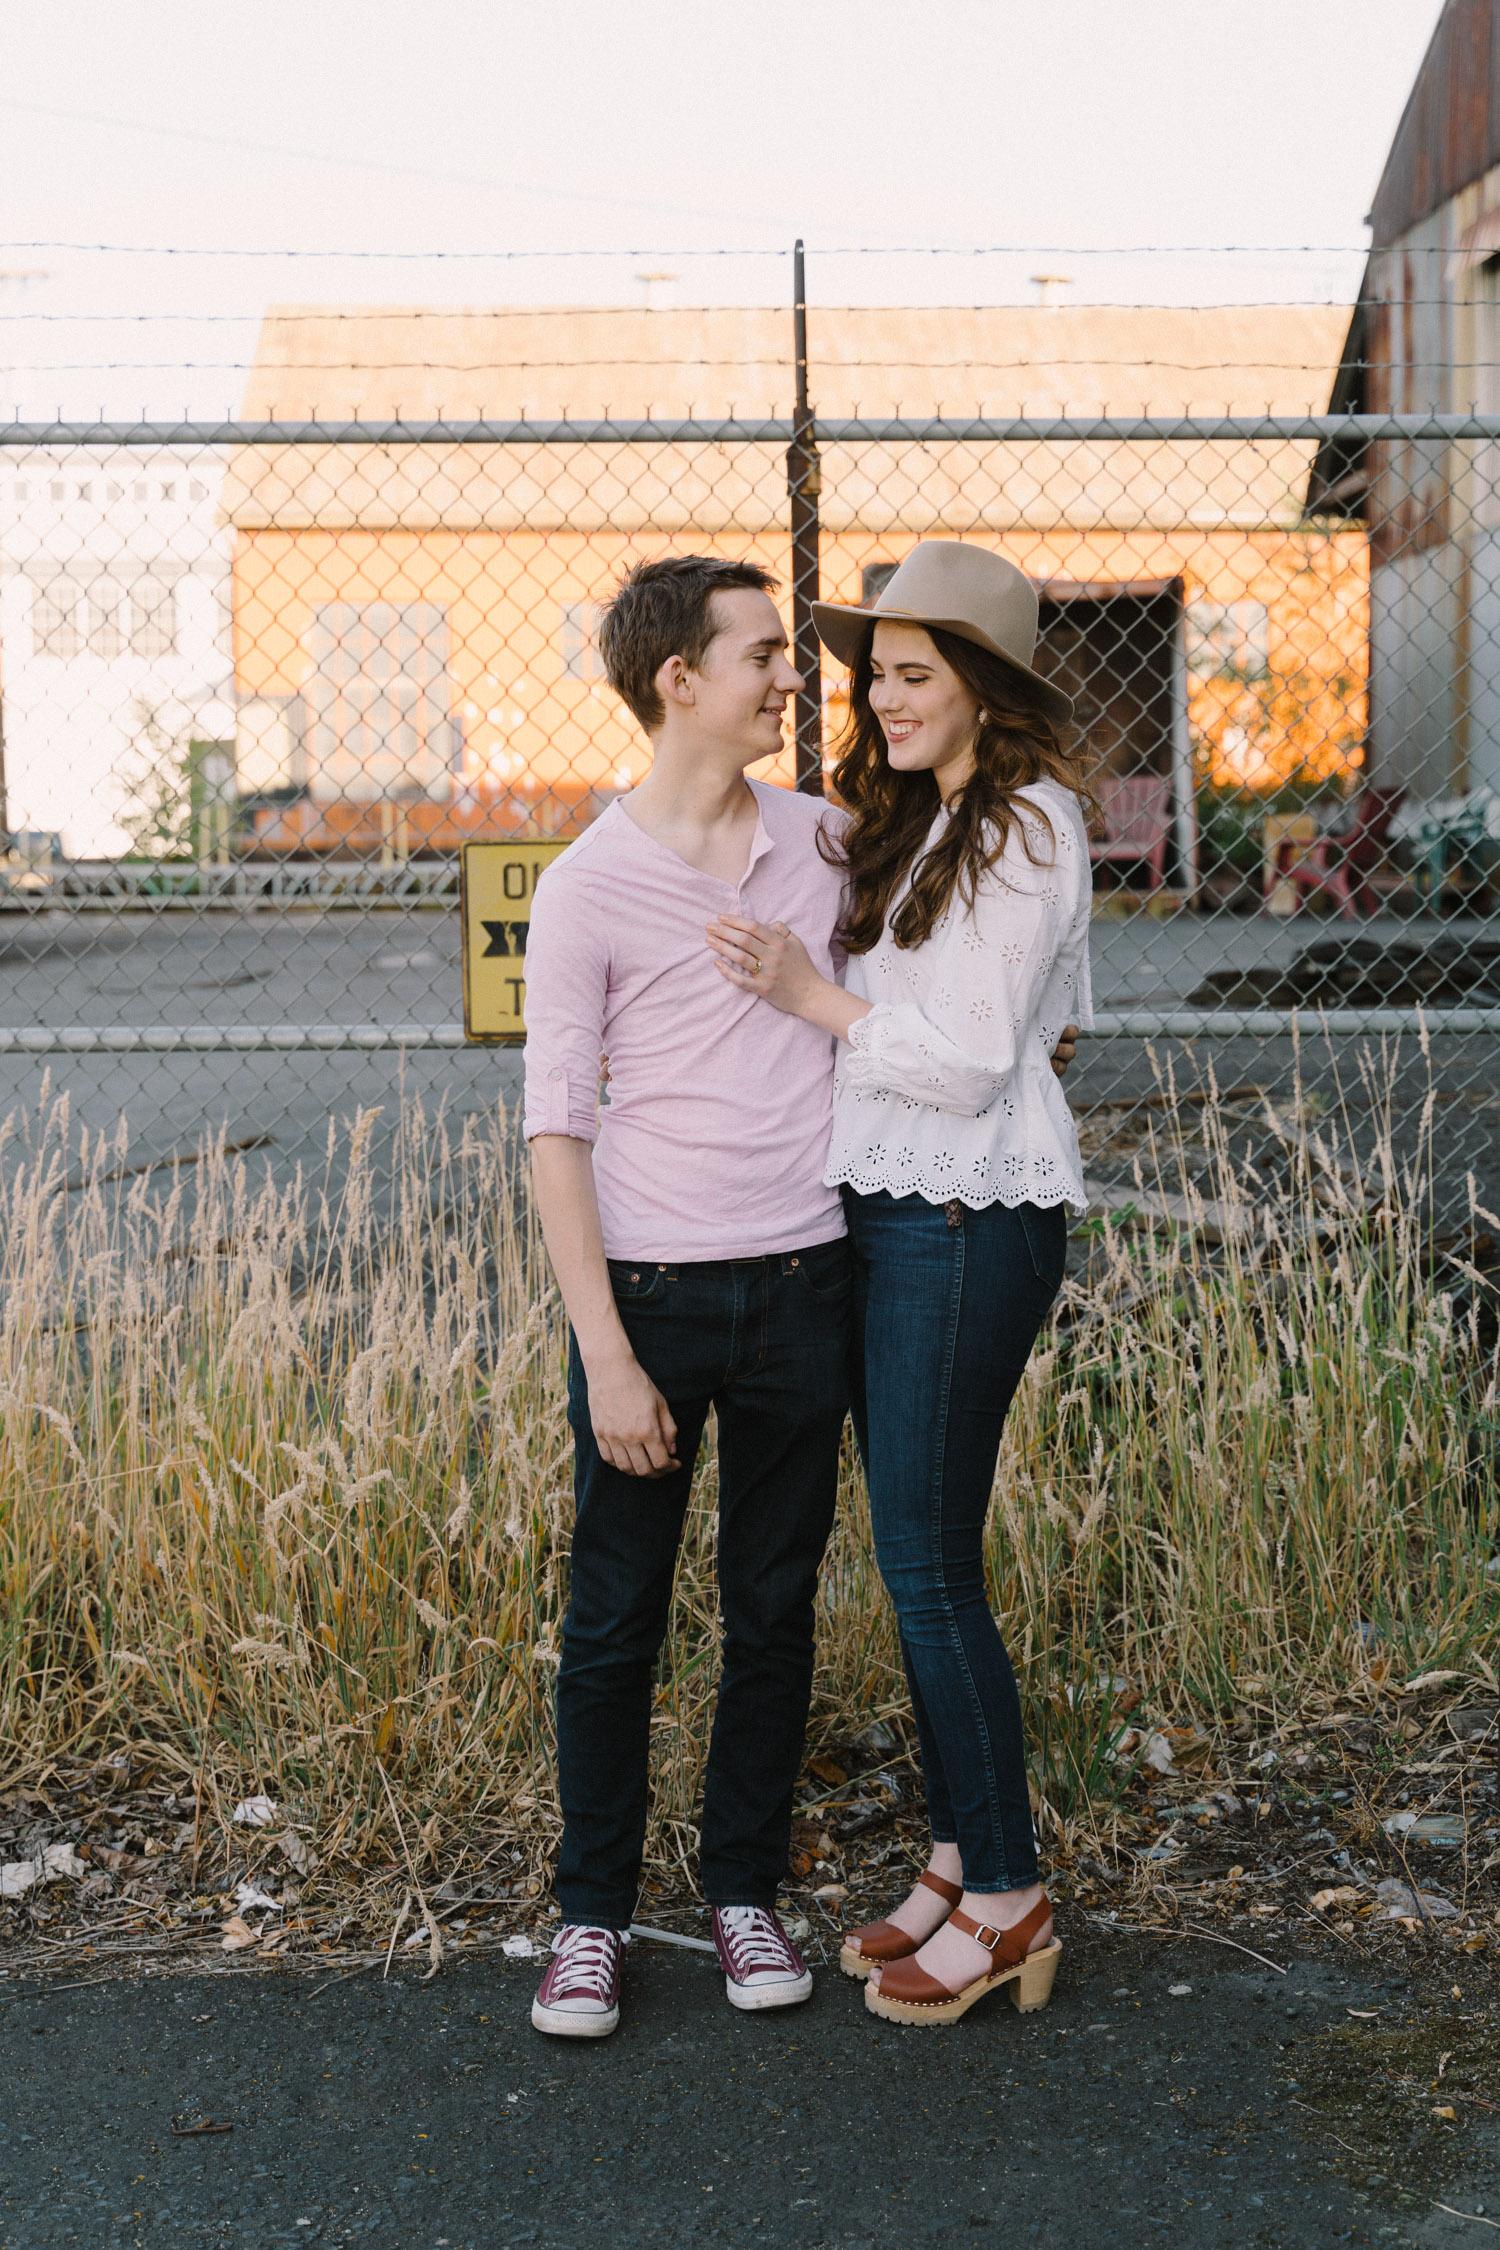 Engagement Photoshoot Locations